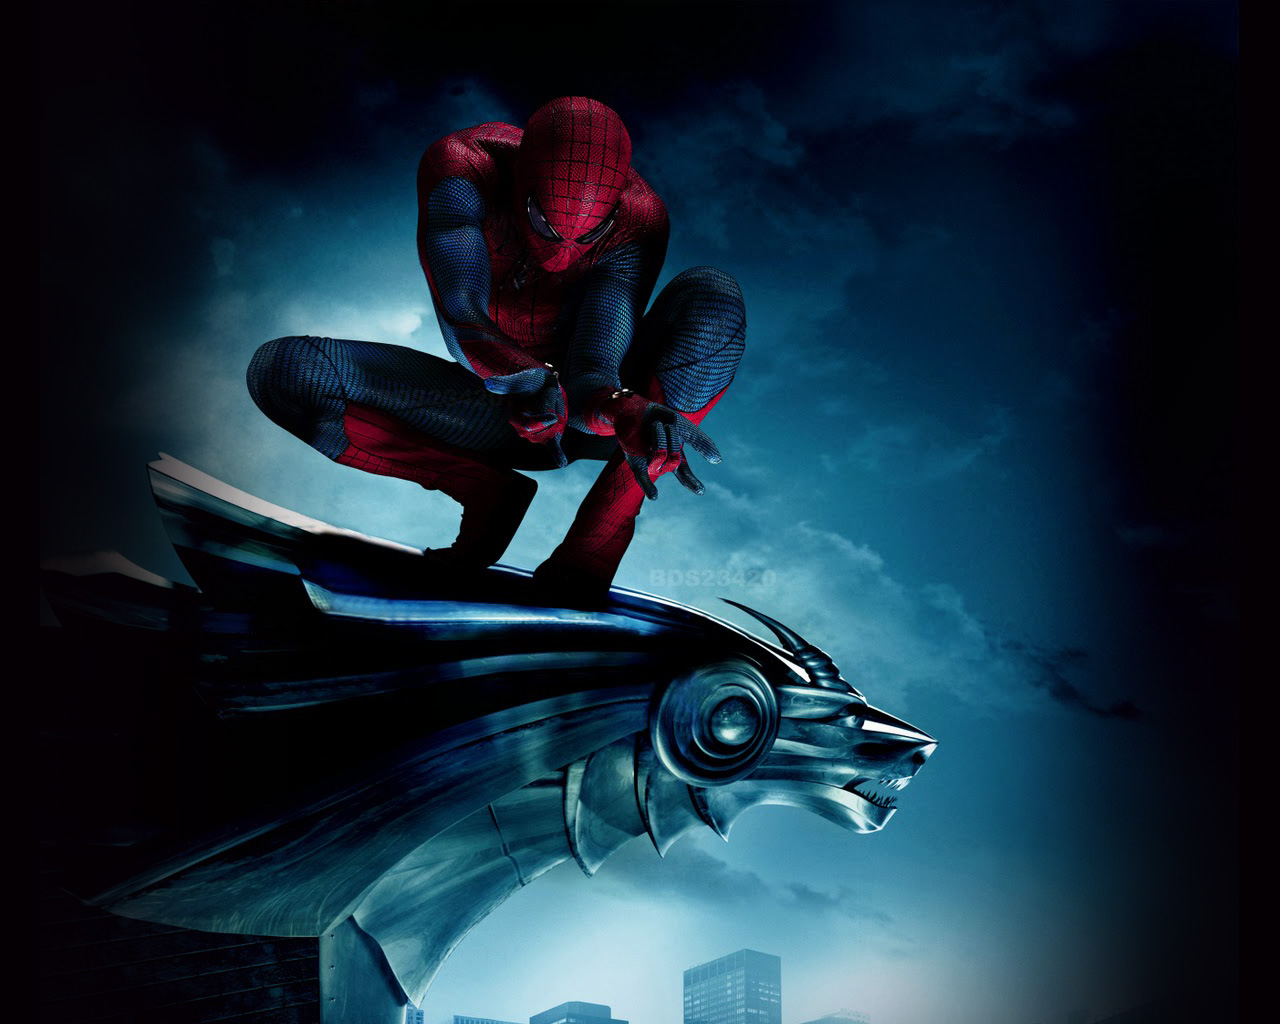 Amazing Spider Man Wallpaper | New Stylish Wallpaper